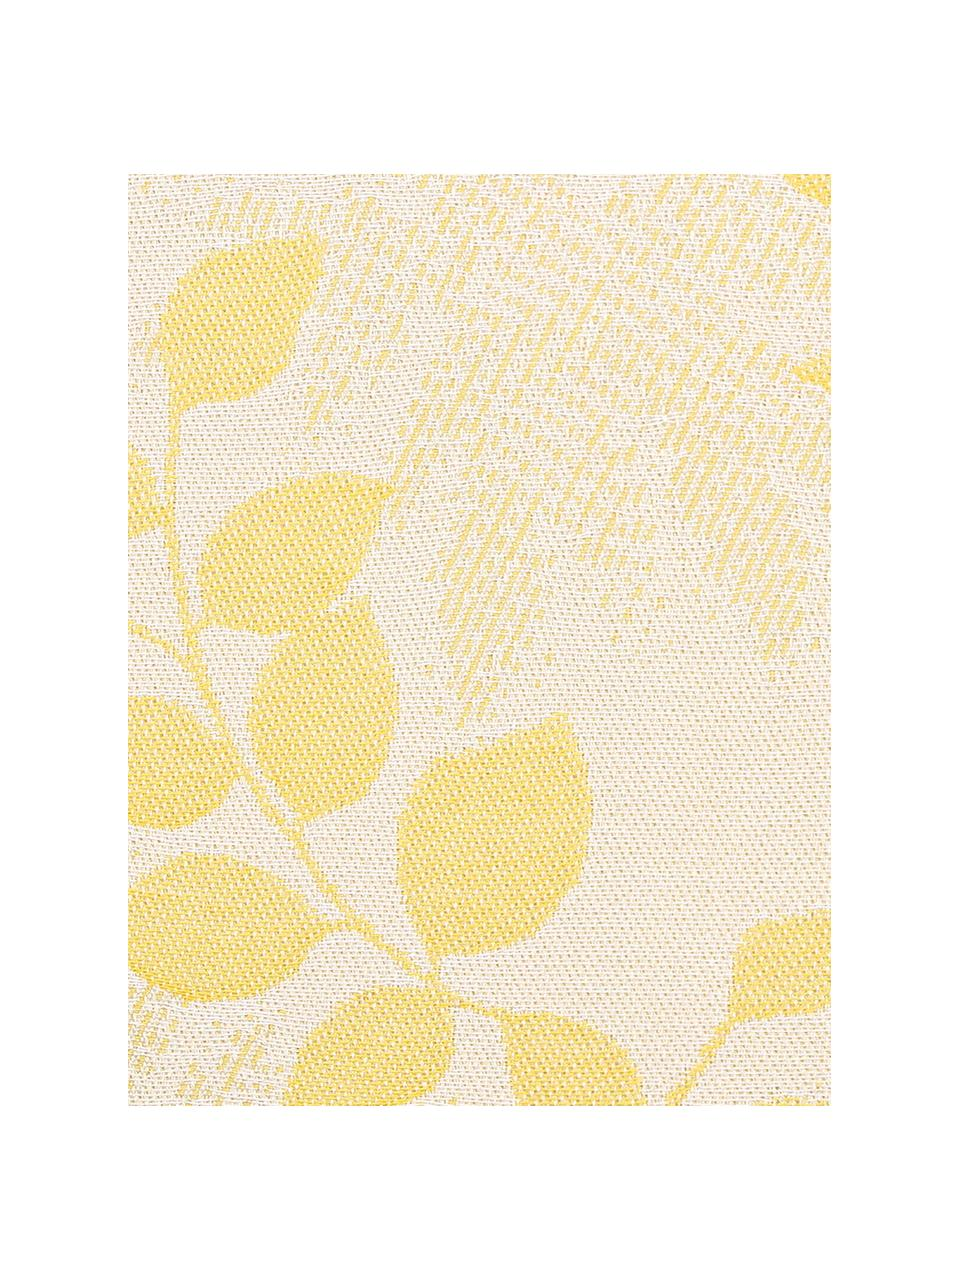 Outdoor-Kissenhülle Cruz mit Blattmuster in Gelb, 100% Dralon (Polyacryl), Gelb, Beige, 50 x 50 cm